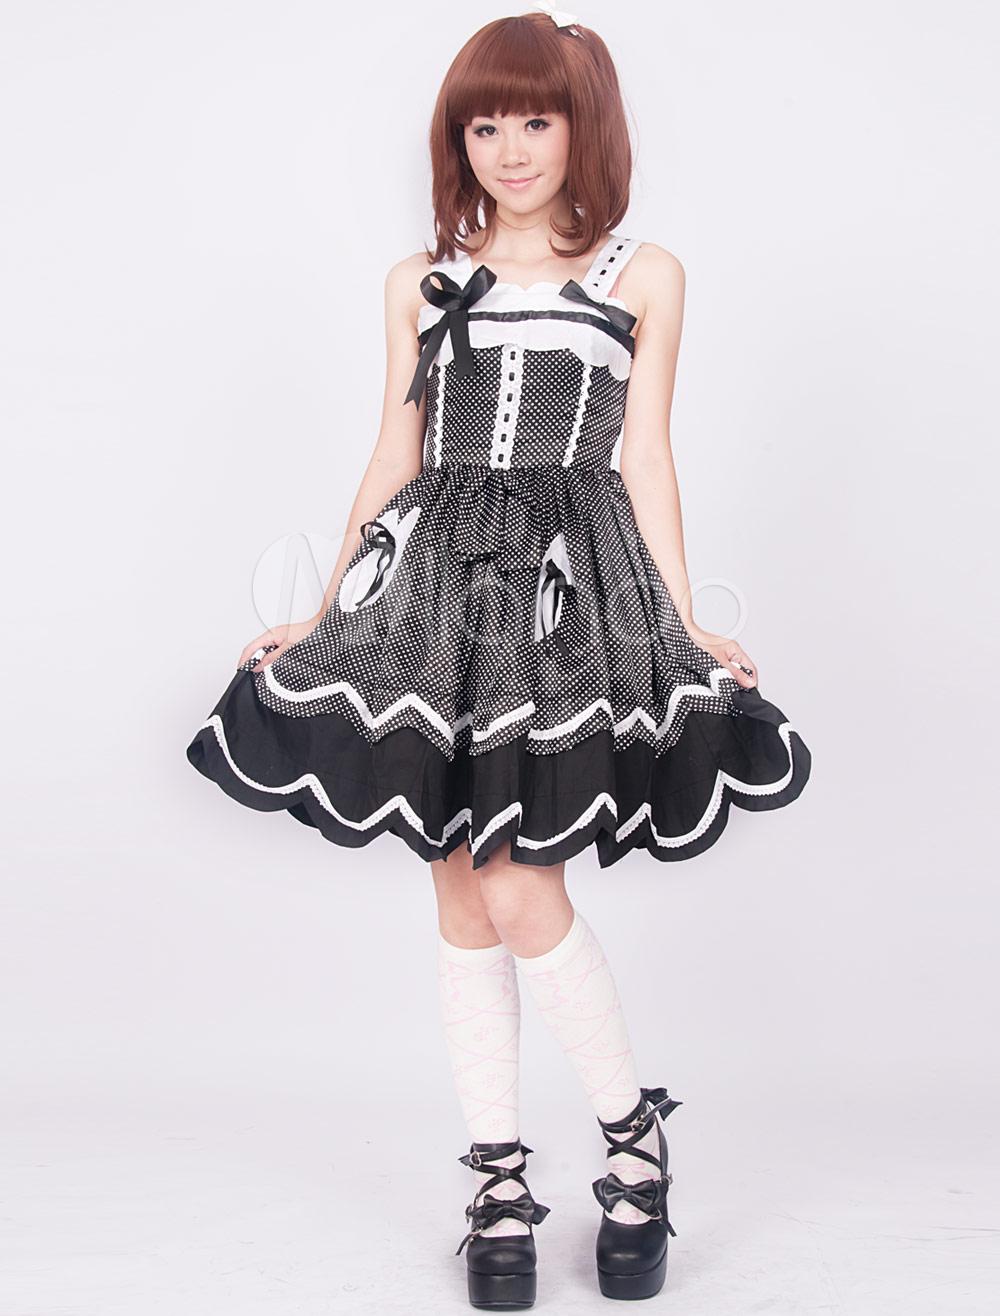 Cotton Black White Polka Dot Sleeveless Sweet Lolita Dress